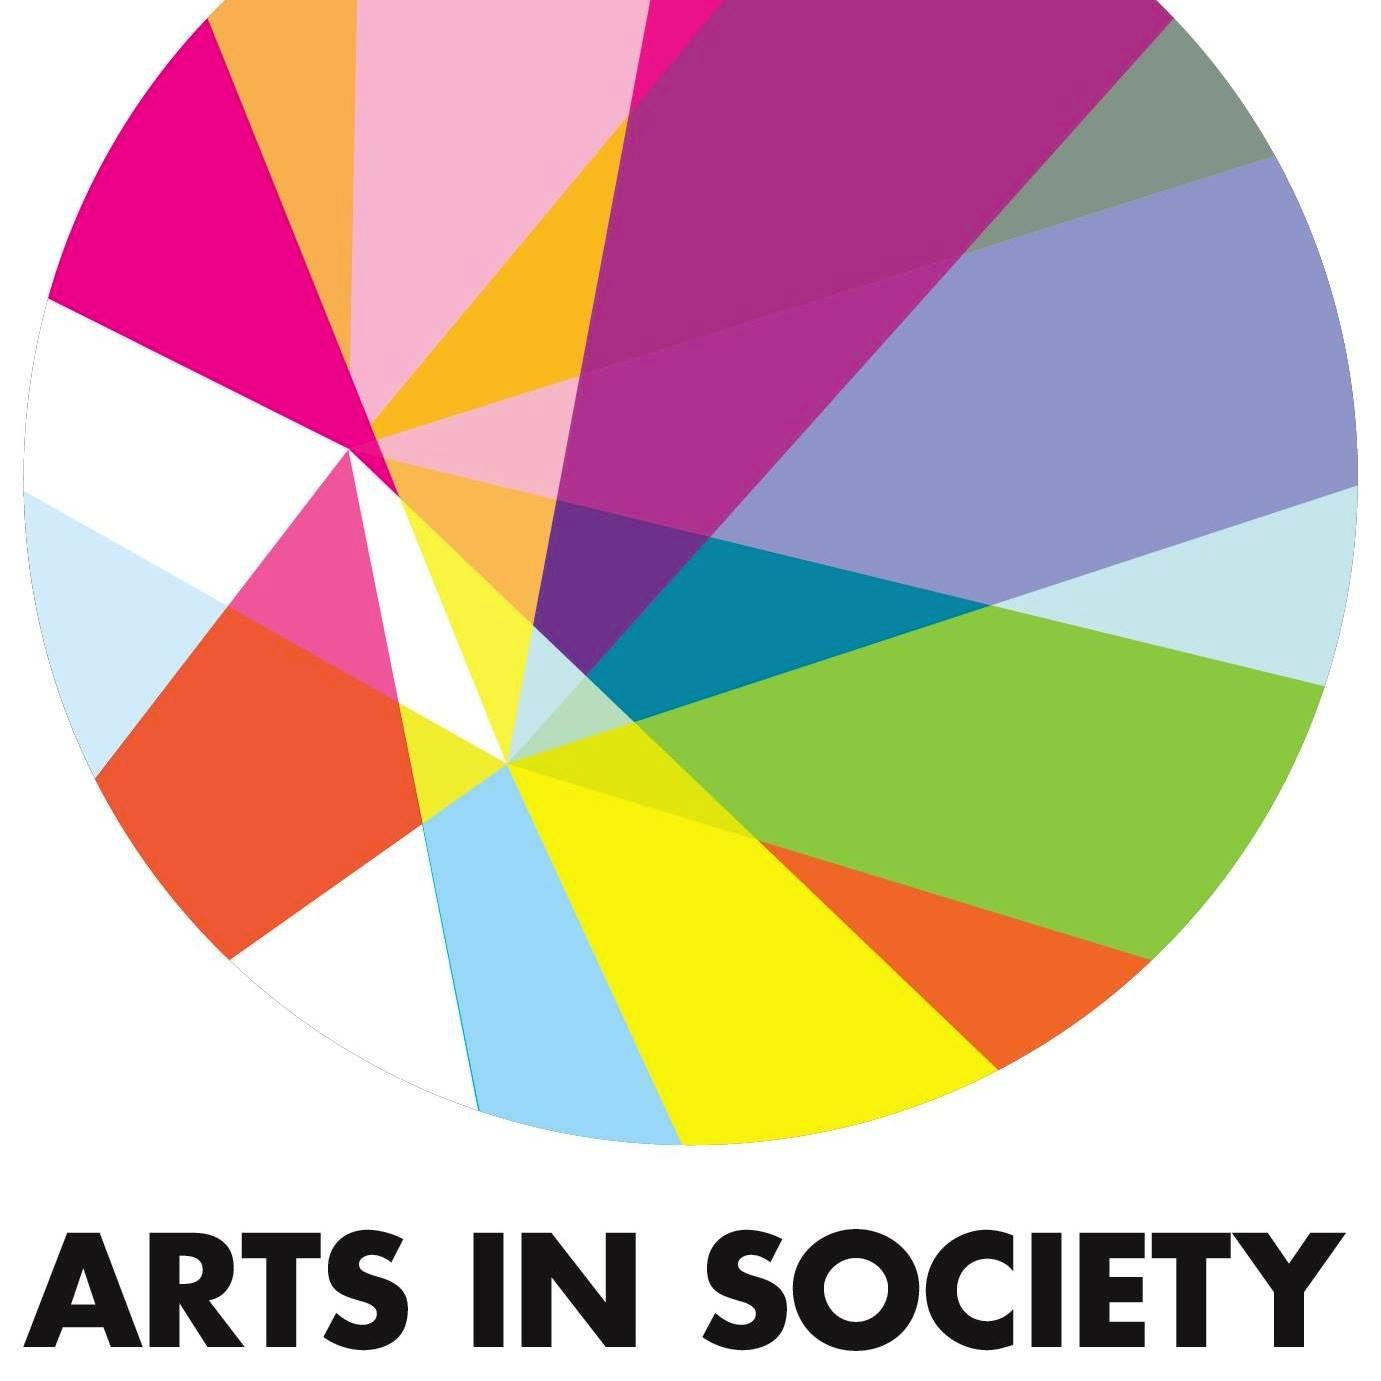 artsinsociety-small.png